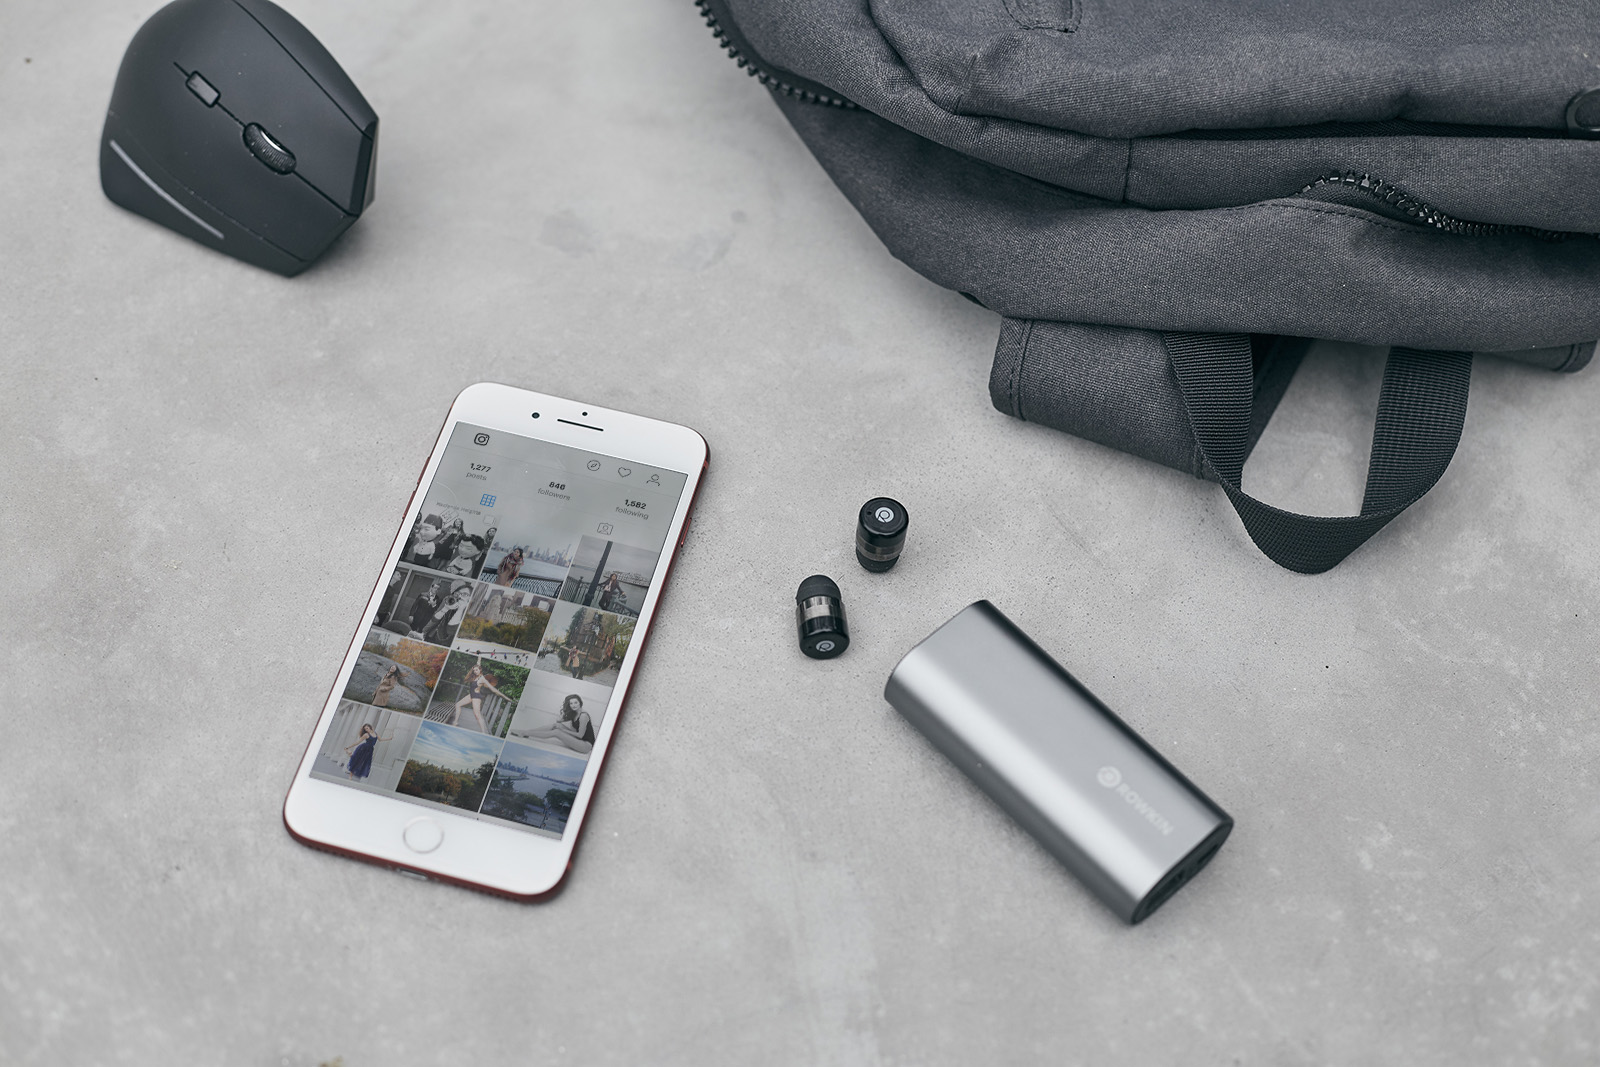 phone-app-bcs-IMG_3387x1600.jpg